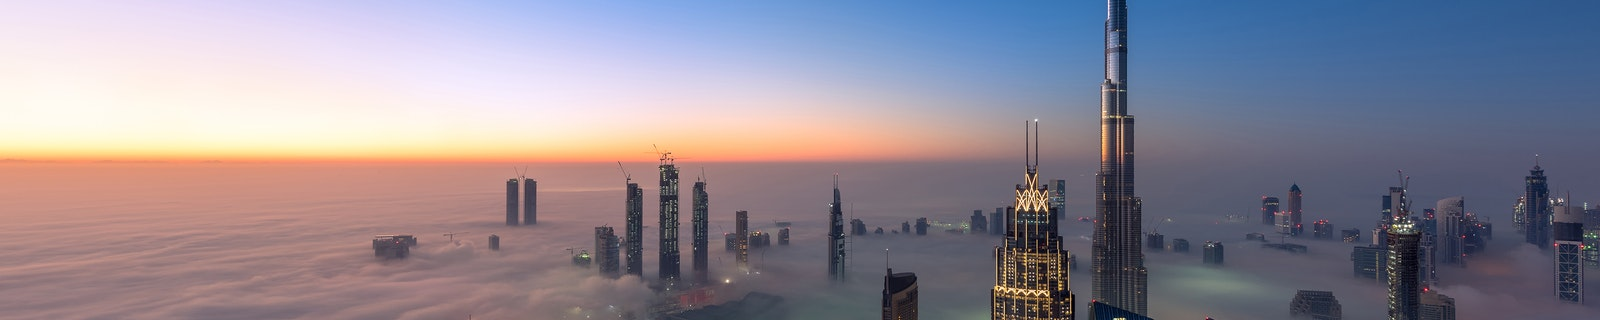 Cityscape of Dubai City